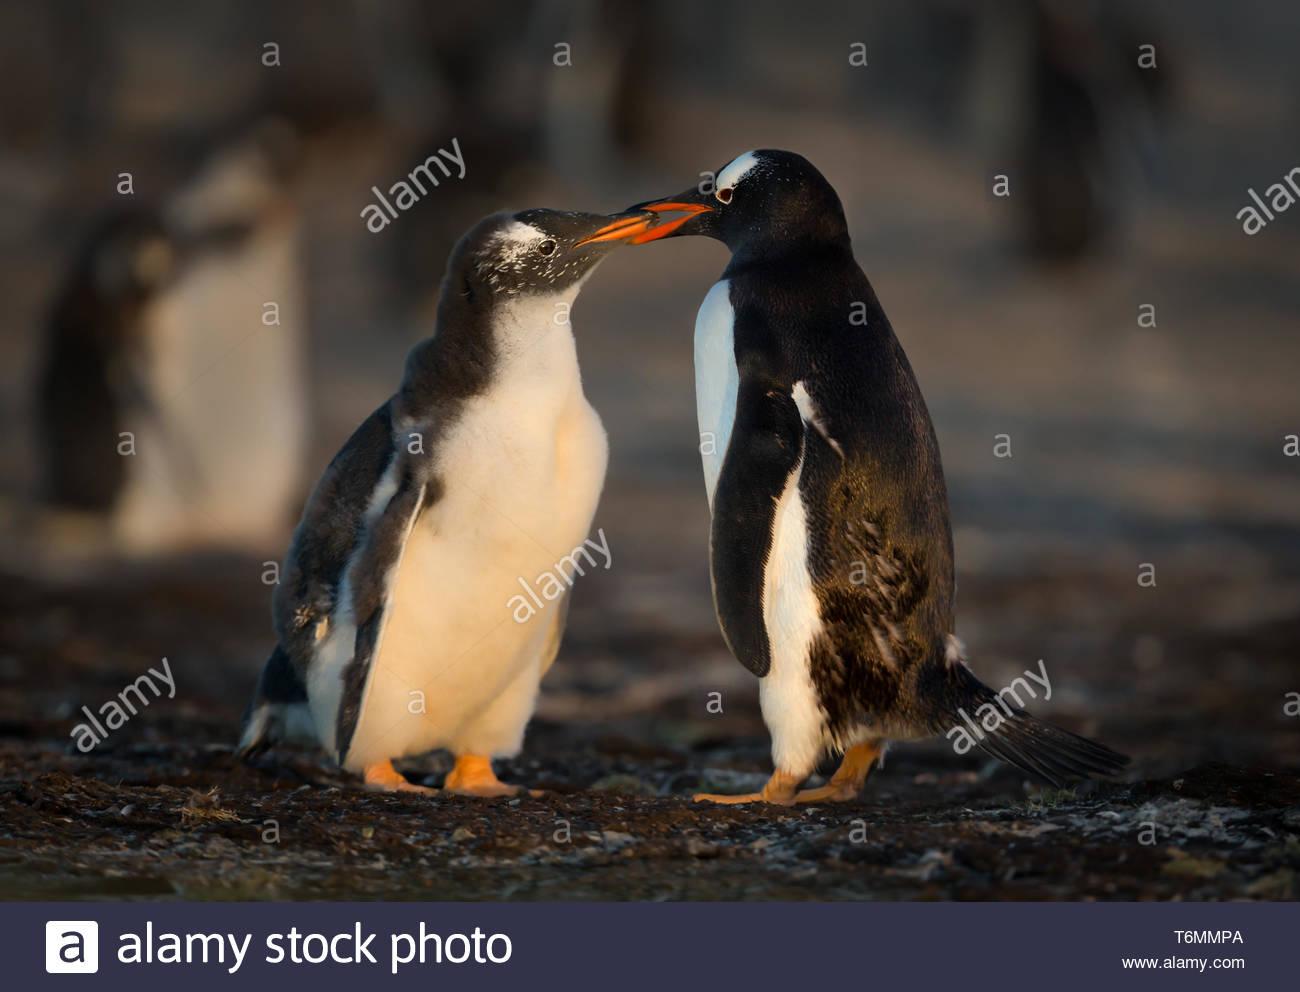 Gentoo penguin, Pygoscelis papua, South Georgia - Stock Image